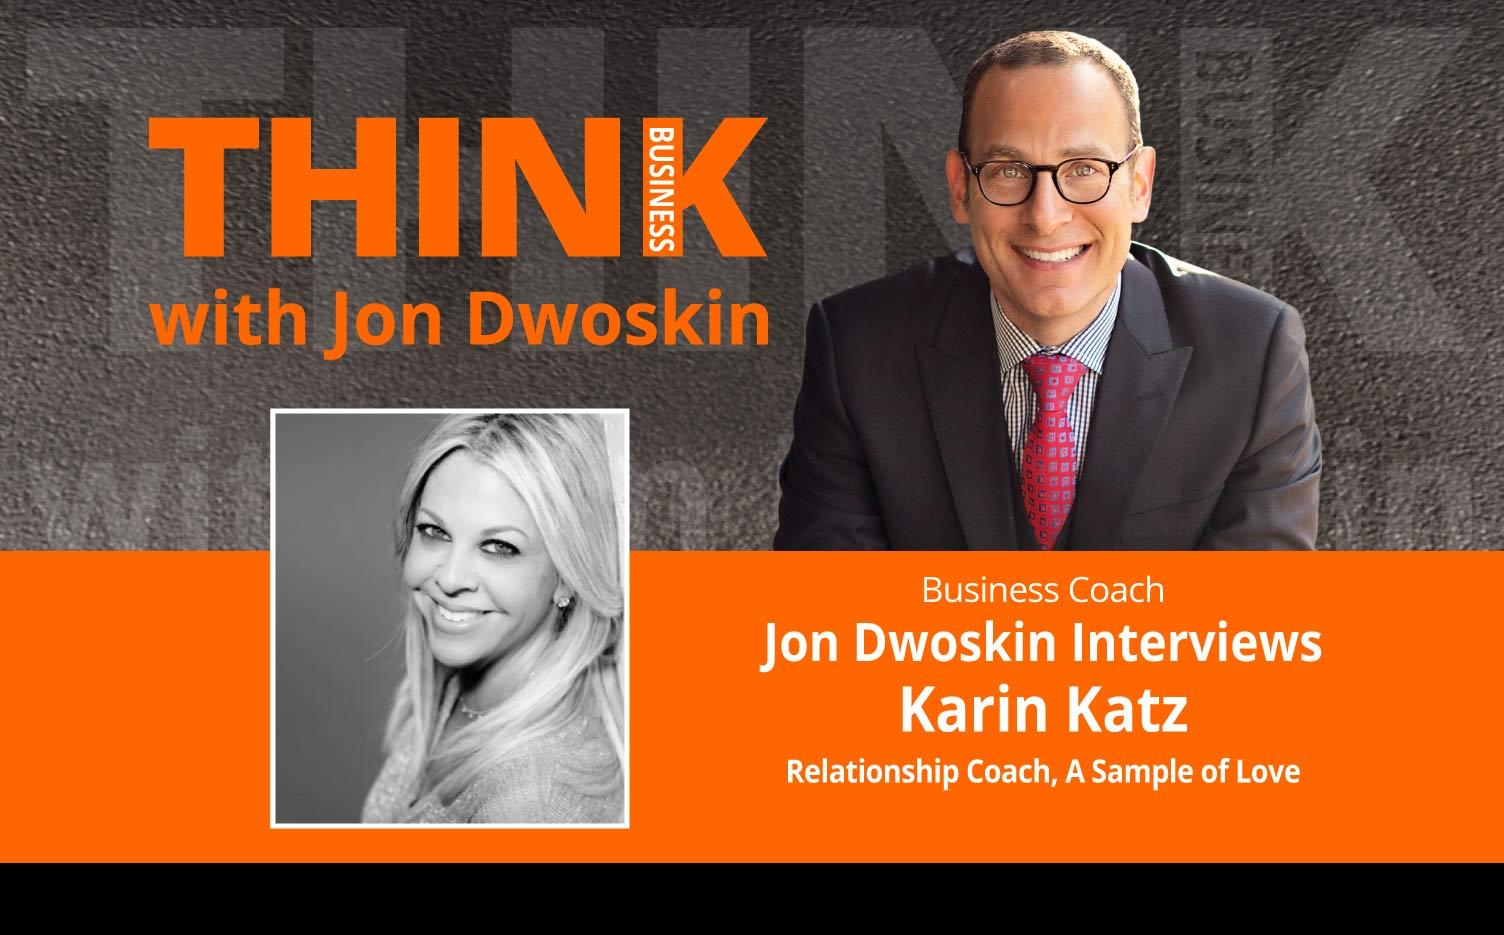 THINK Business Podcast: Jon Dwoskin Interviews Karin Katz, Relationship Coach, A Sample of Love